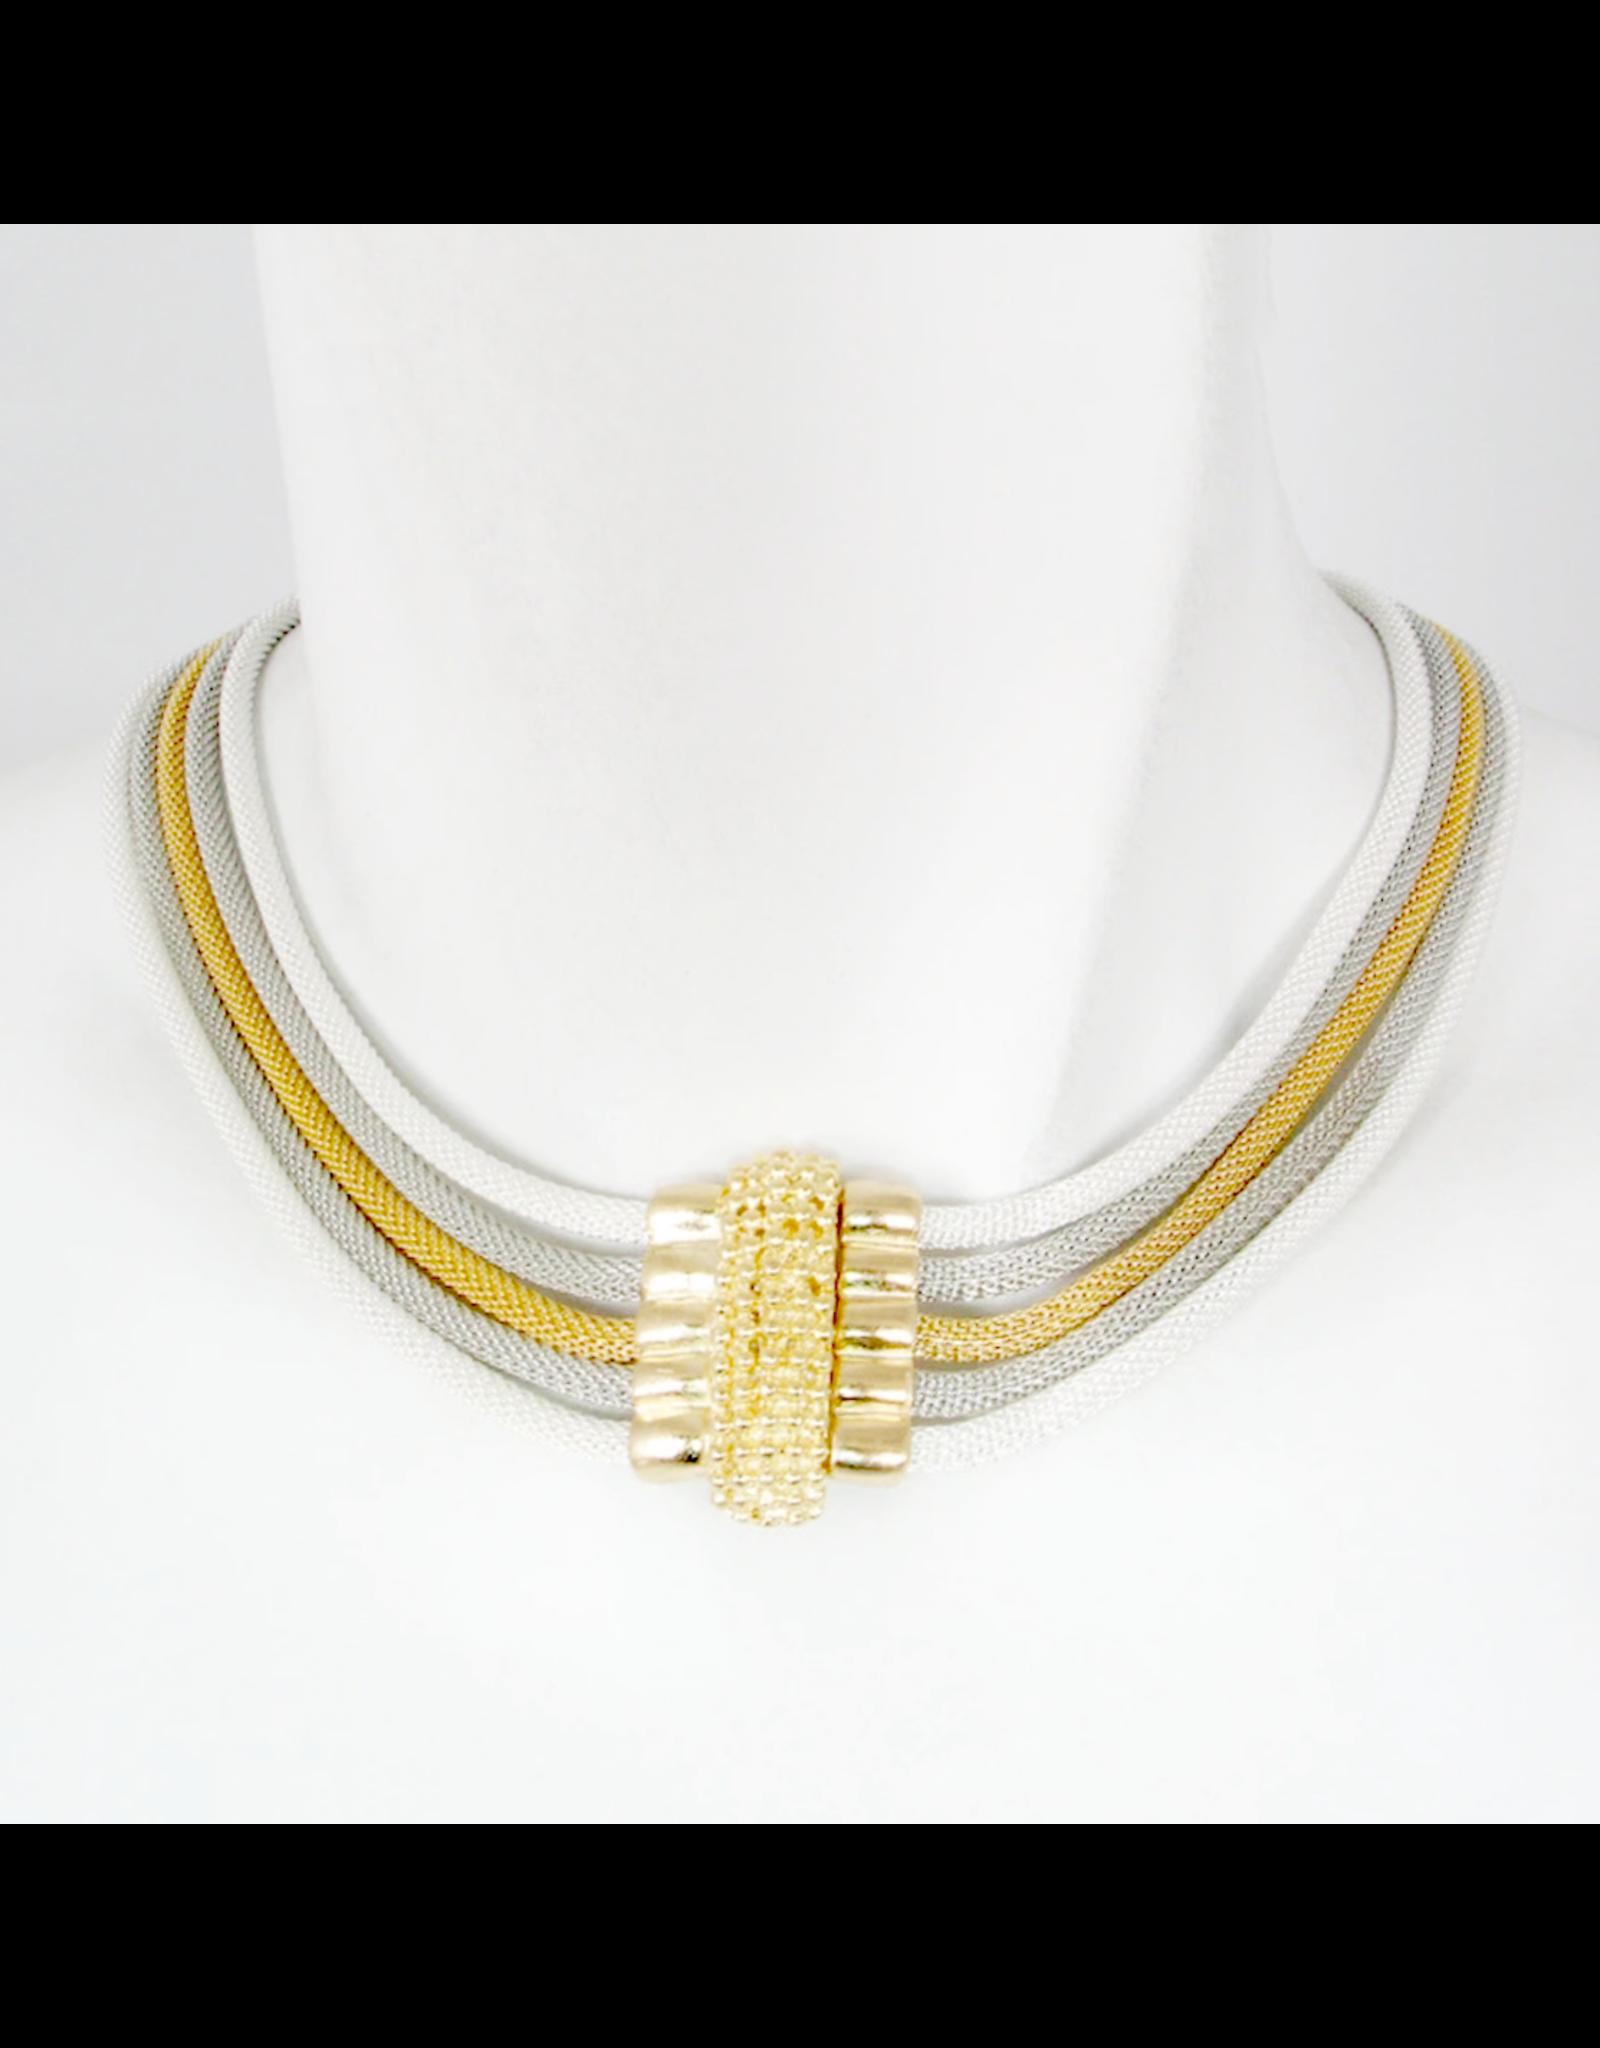 Erica Zap Design Erica Zap 5-Strand Magnetic Necklace